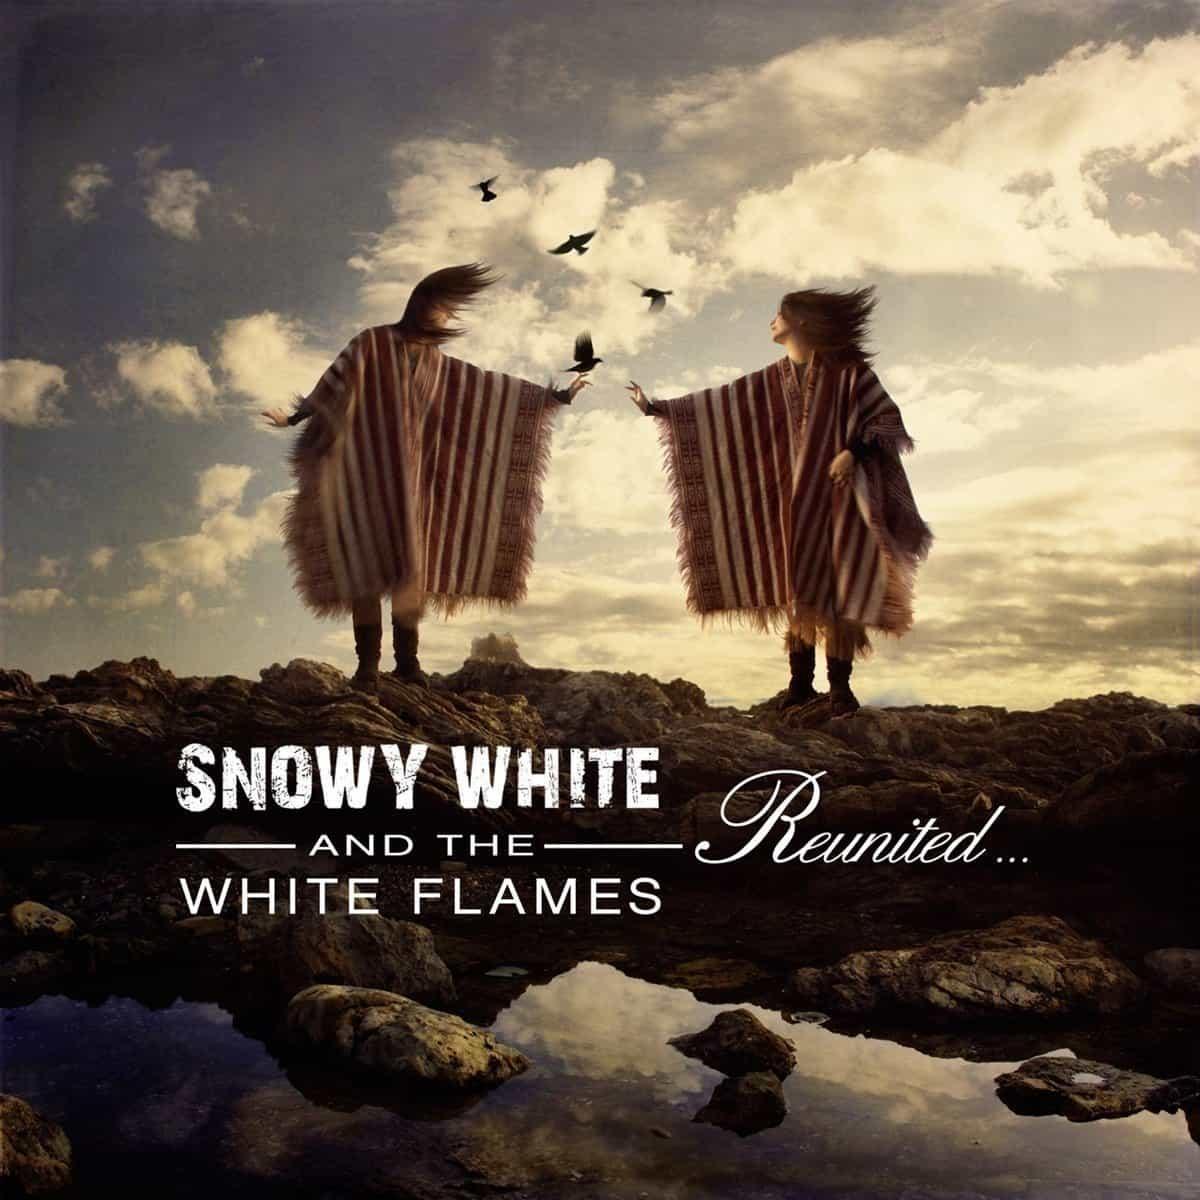 snowy white reunited